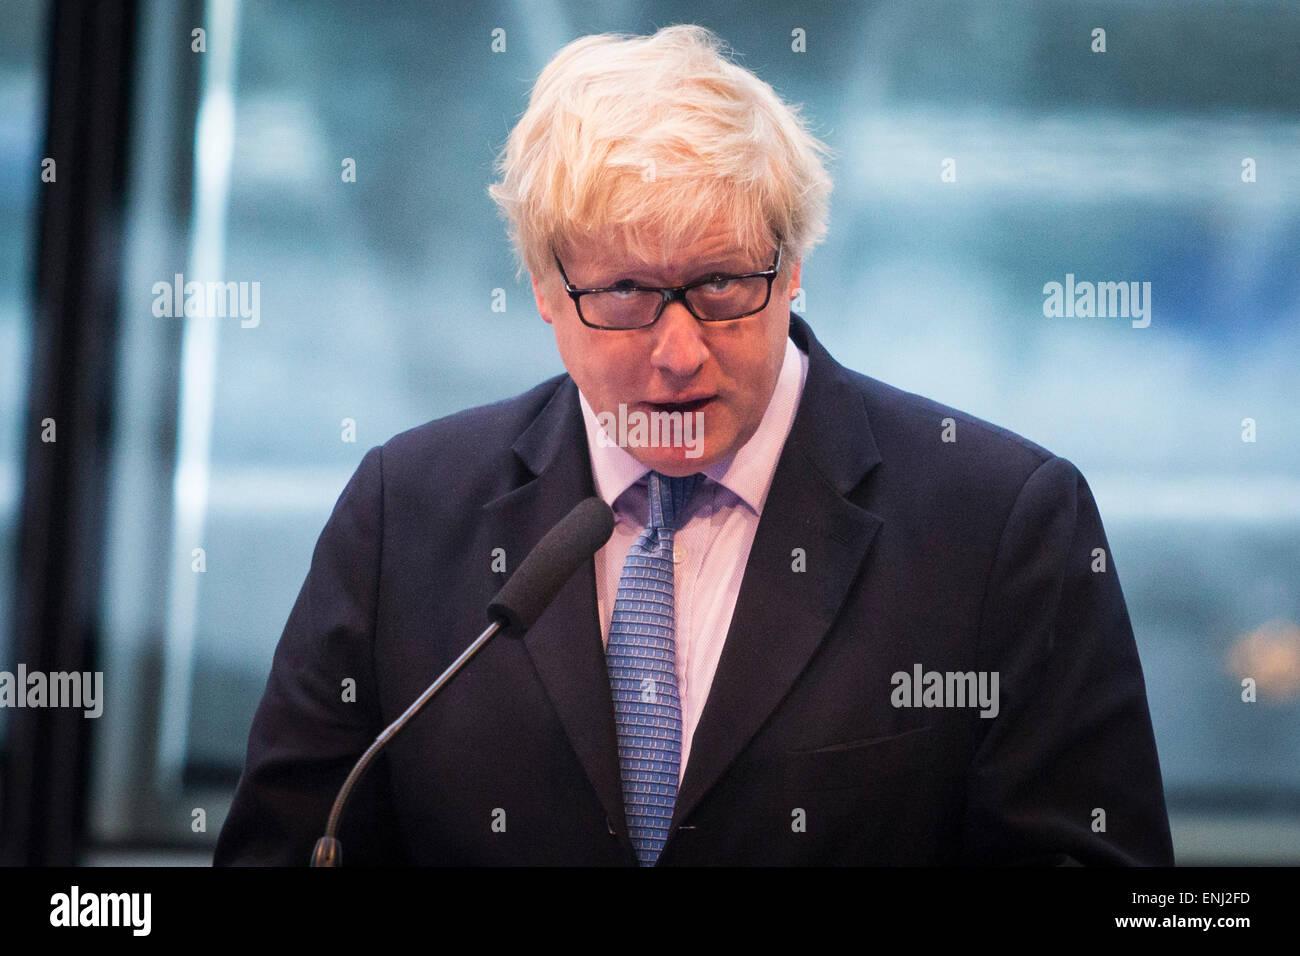 UNITED KINGDOM, London : The Mayor of London Boris Johnson addresses members of the London Assembly at City Hall - Stock Image